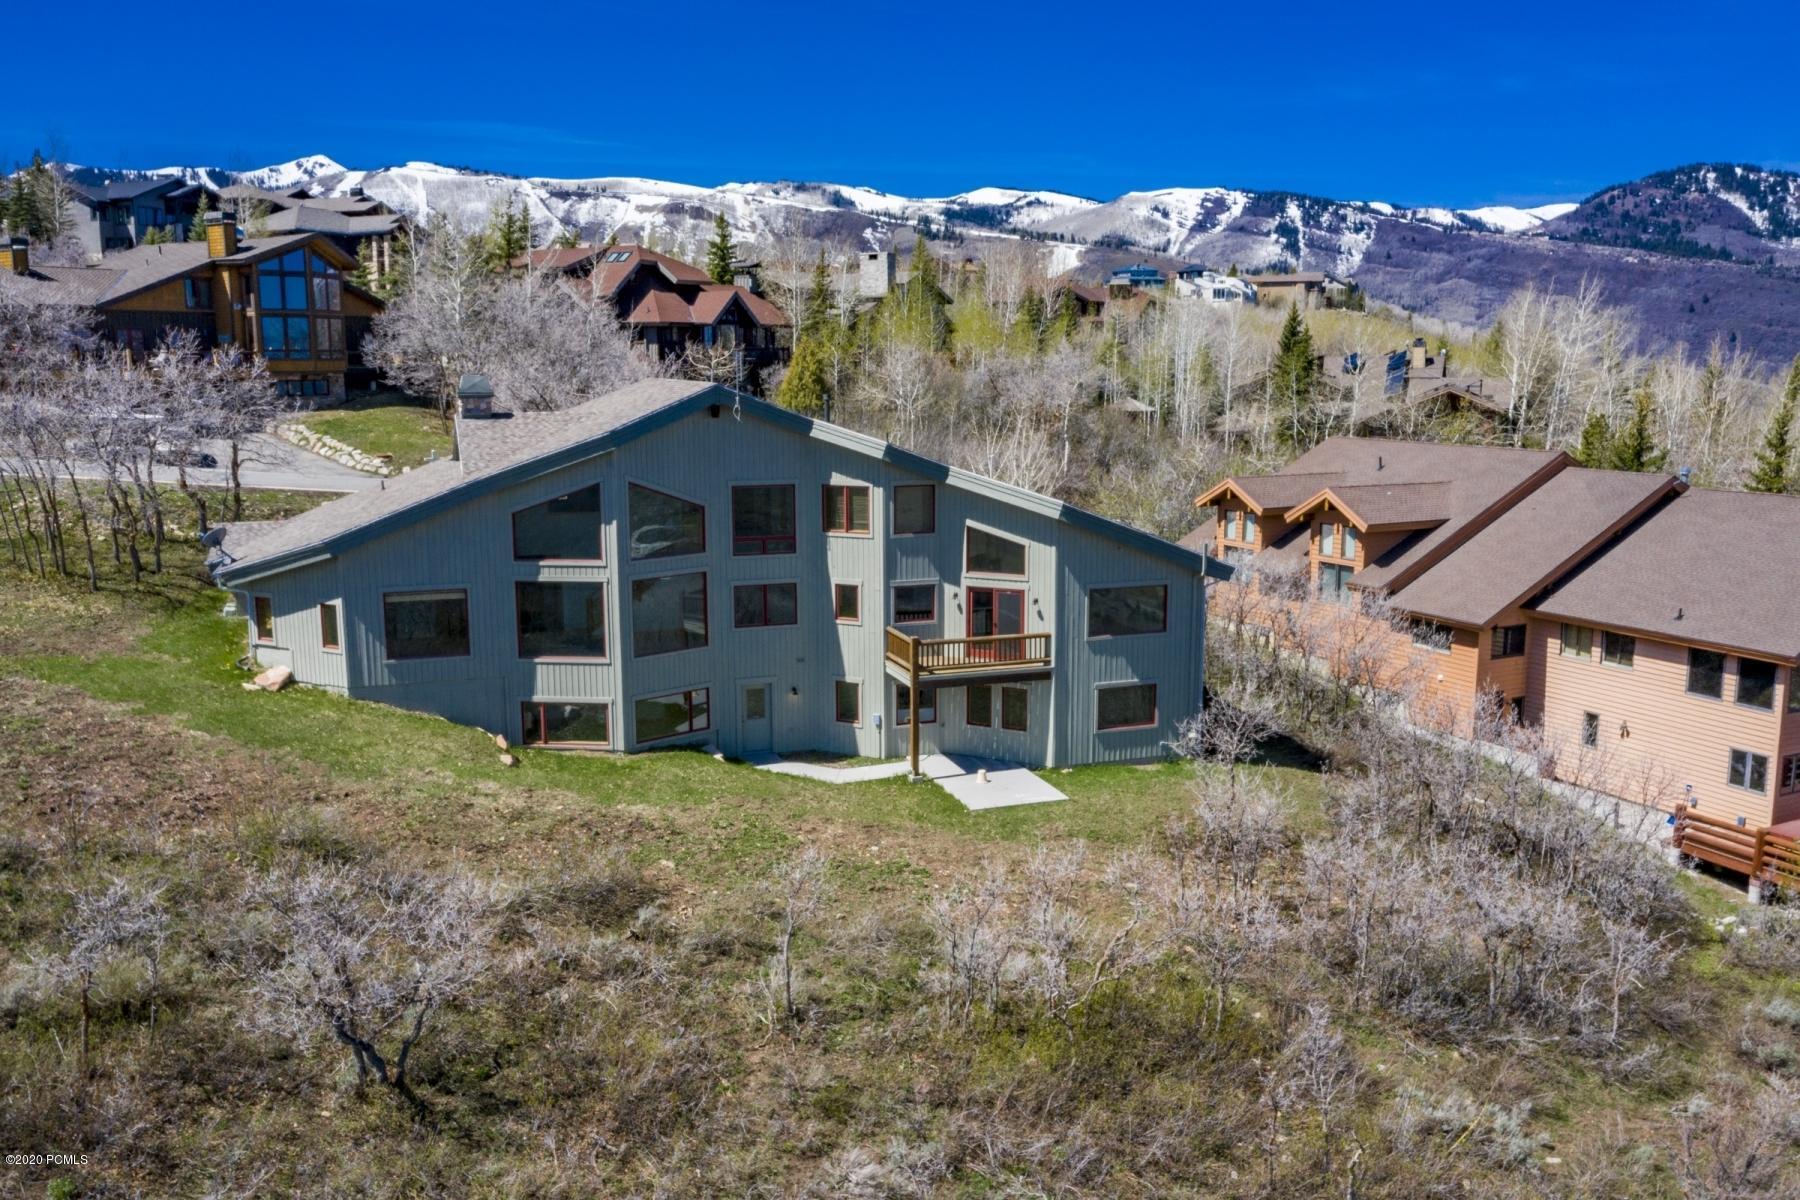 1555 Aerie Circle, Park City, Utah 84060, 7 Bedrooms Bedrooms, ,5 BathroomsBathrooms,Single Family,For Sale,Aerie,20190109112430415765000000